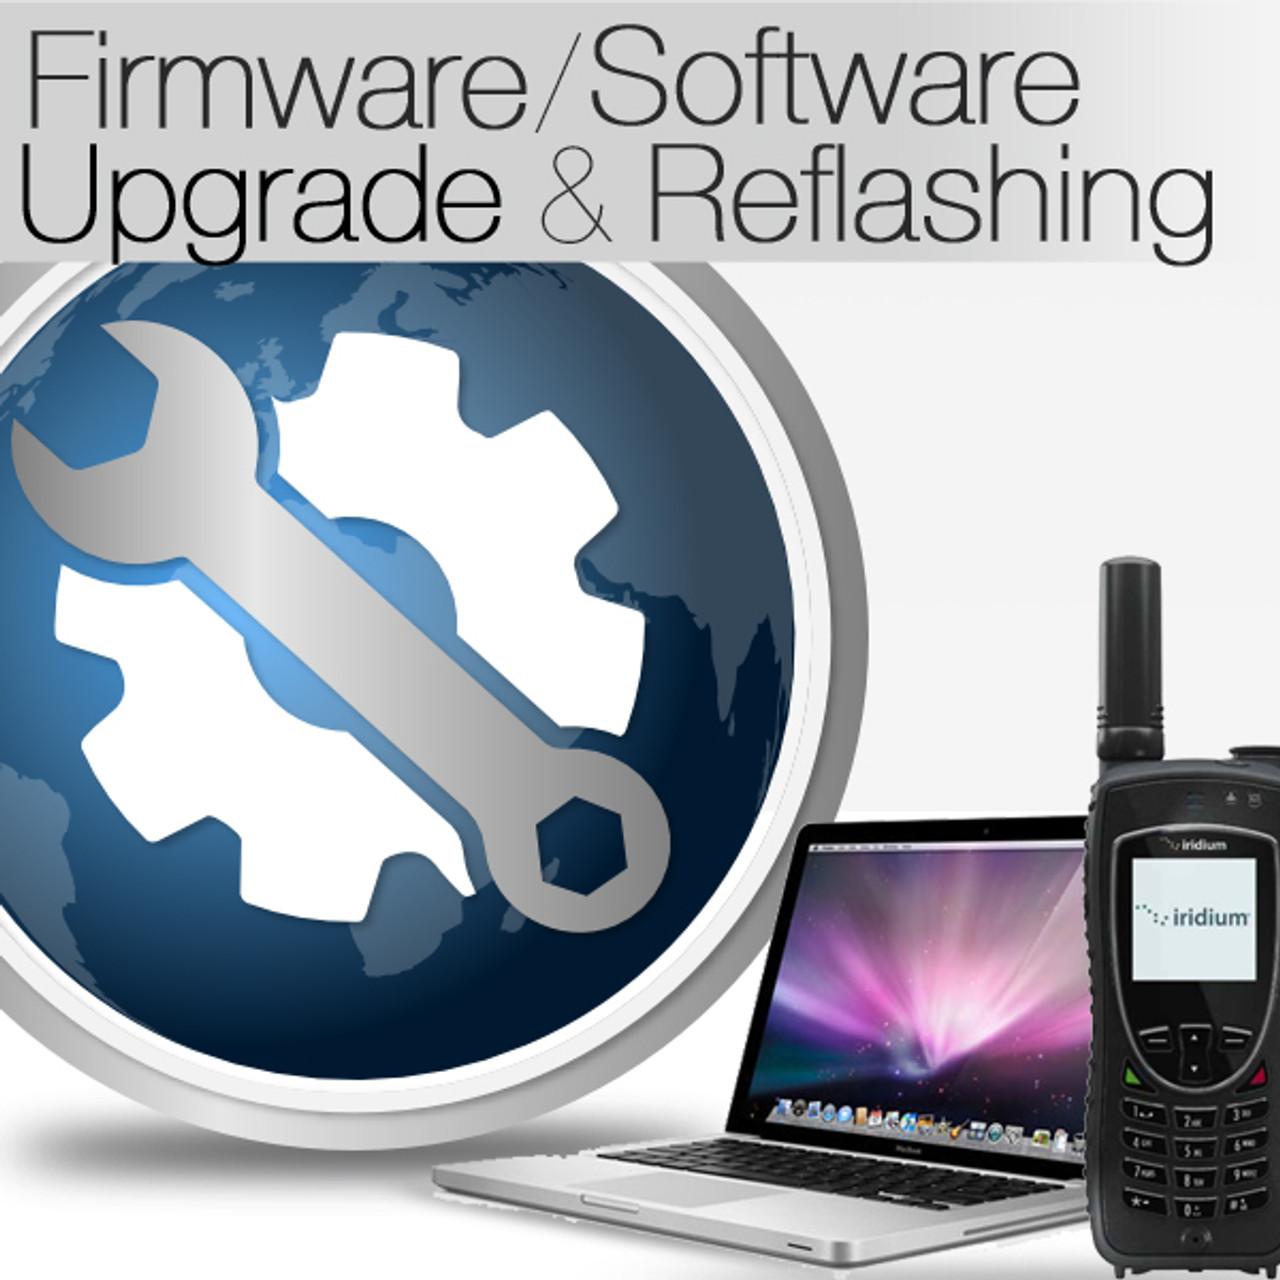 Firmware Upgrade for Satellite Phones & BGANs